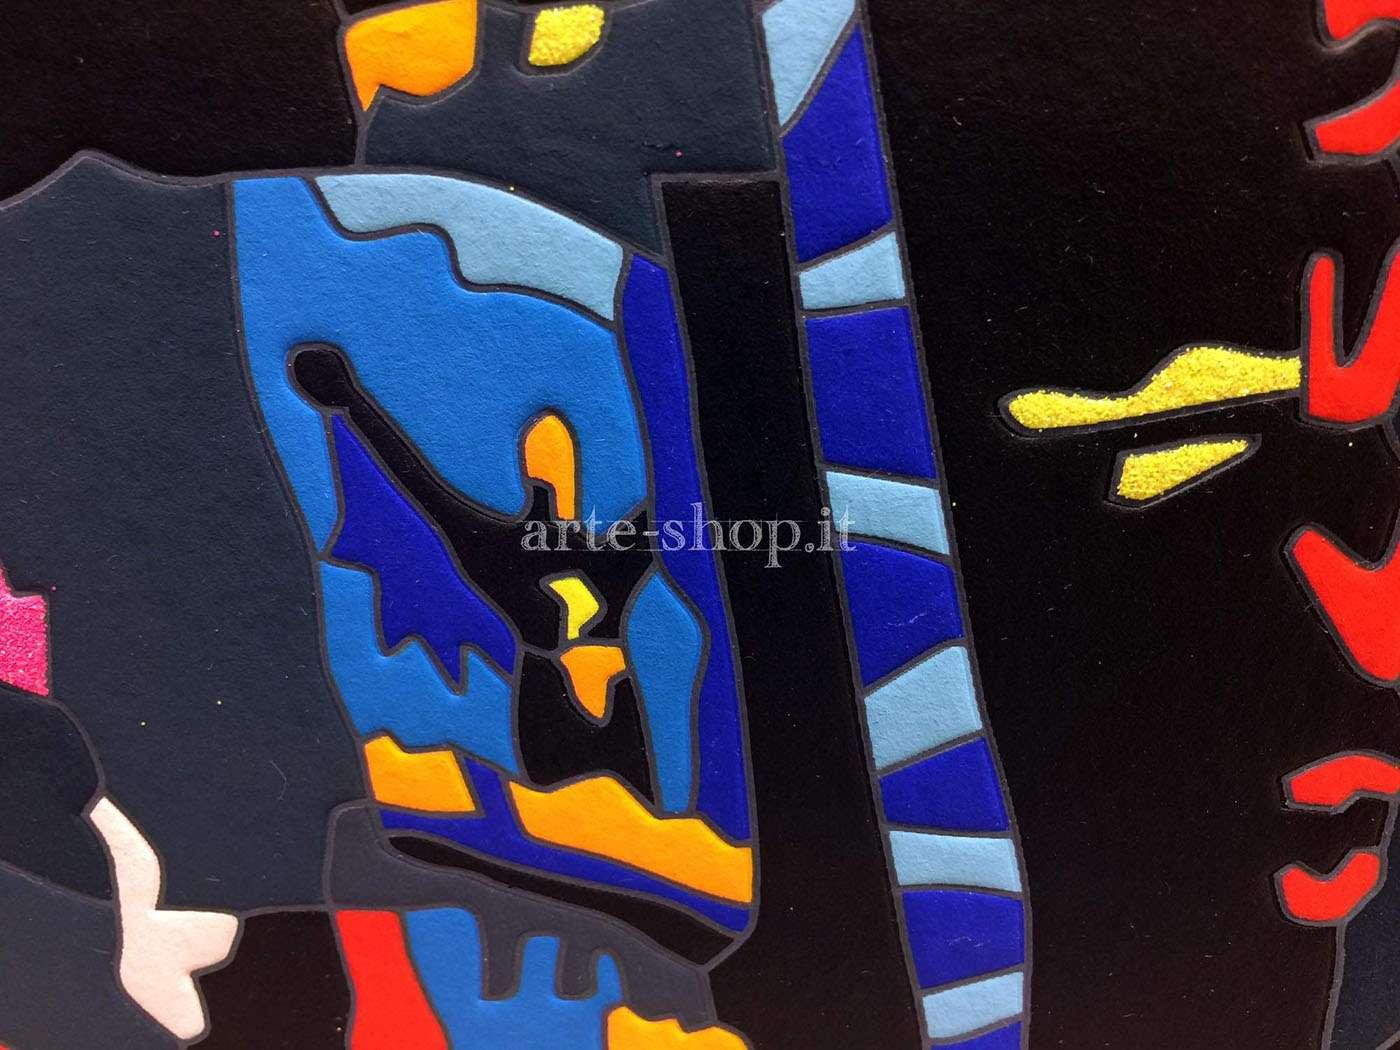 arte pentagono shop dettaglio numero 236